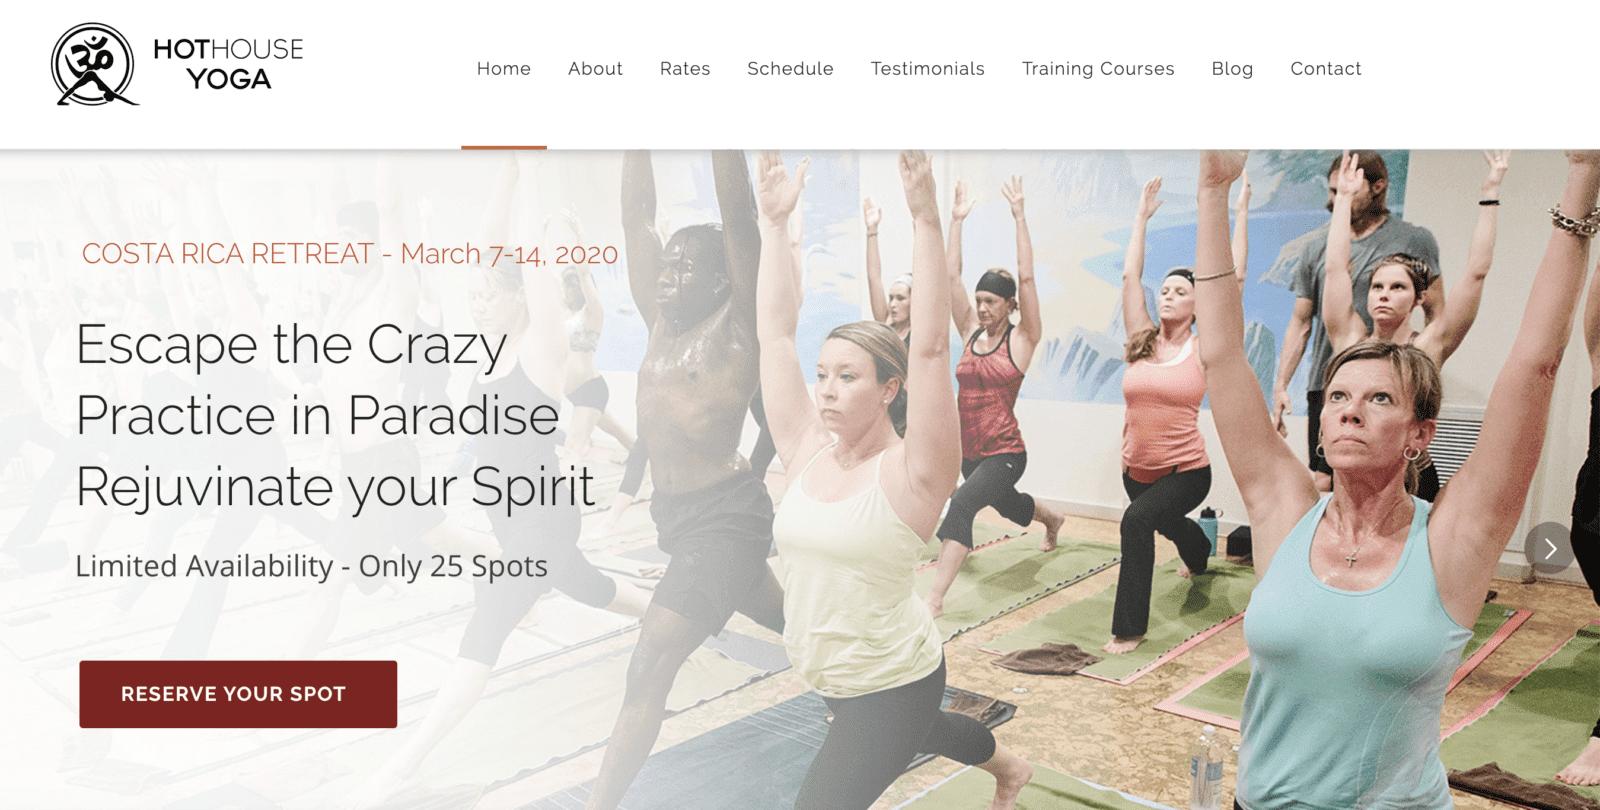 hot house yoga website